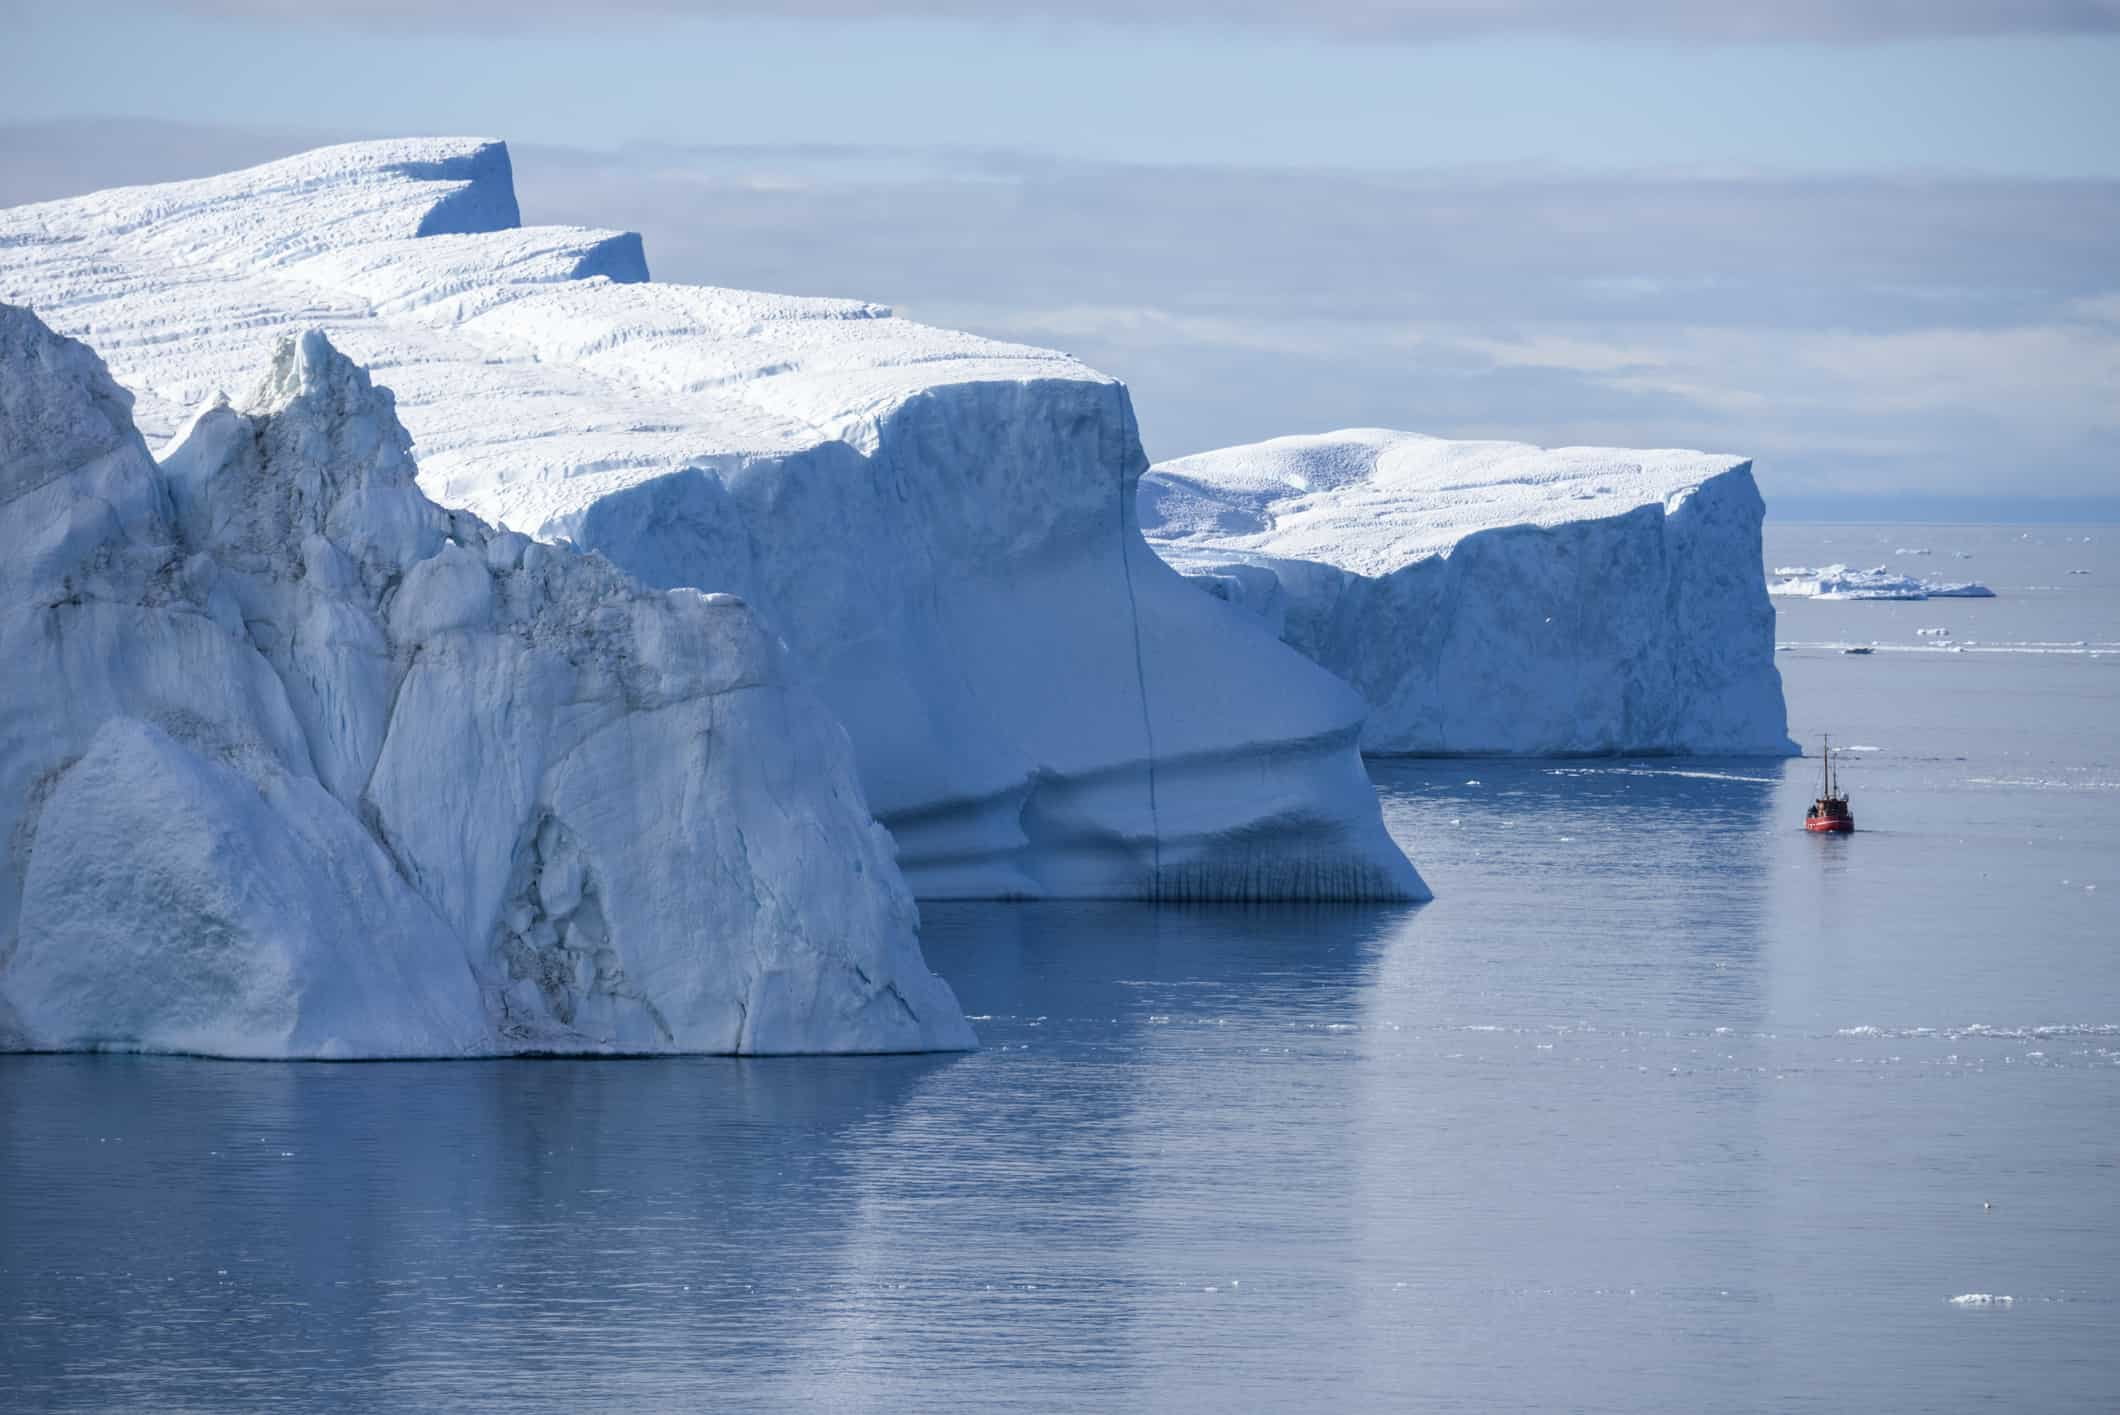 Iceberg, Greenland, Ilulissat Icefjord